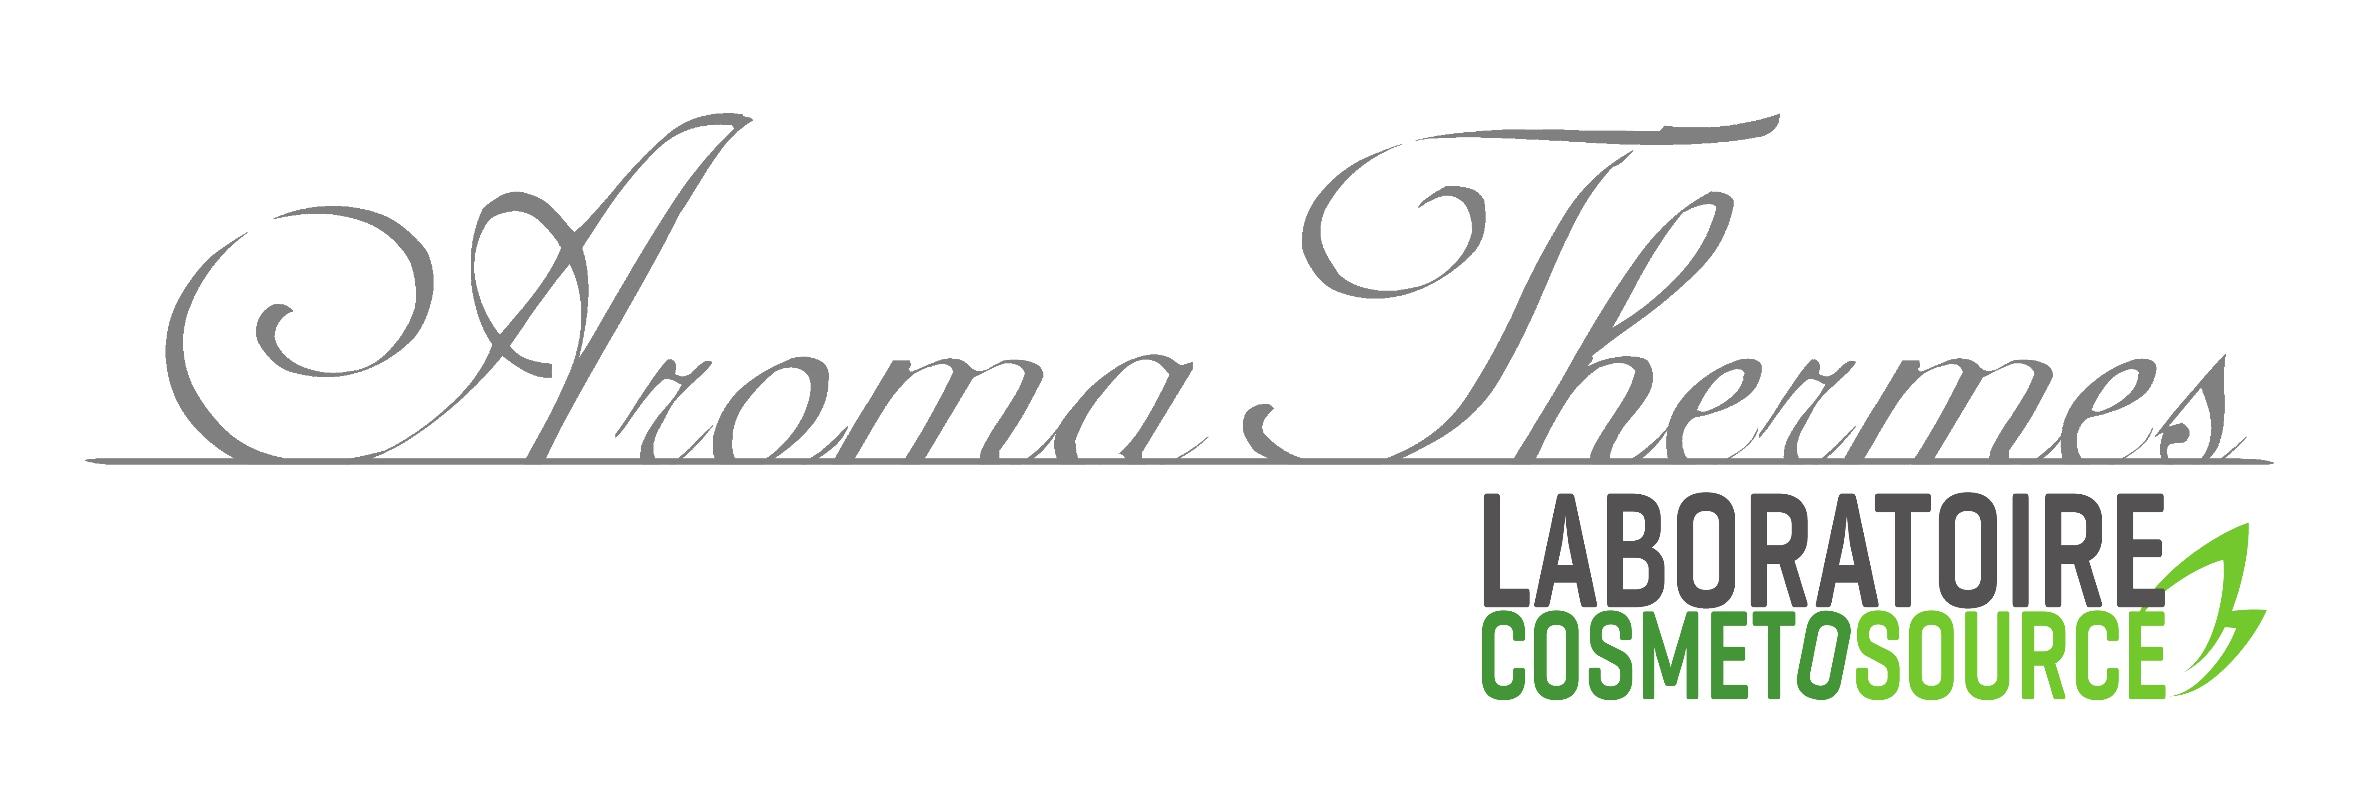 Logo aromathermes cosmetosource